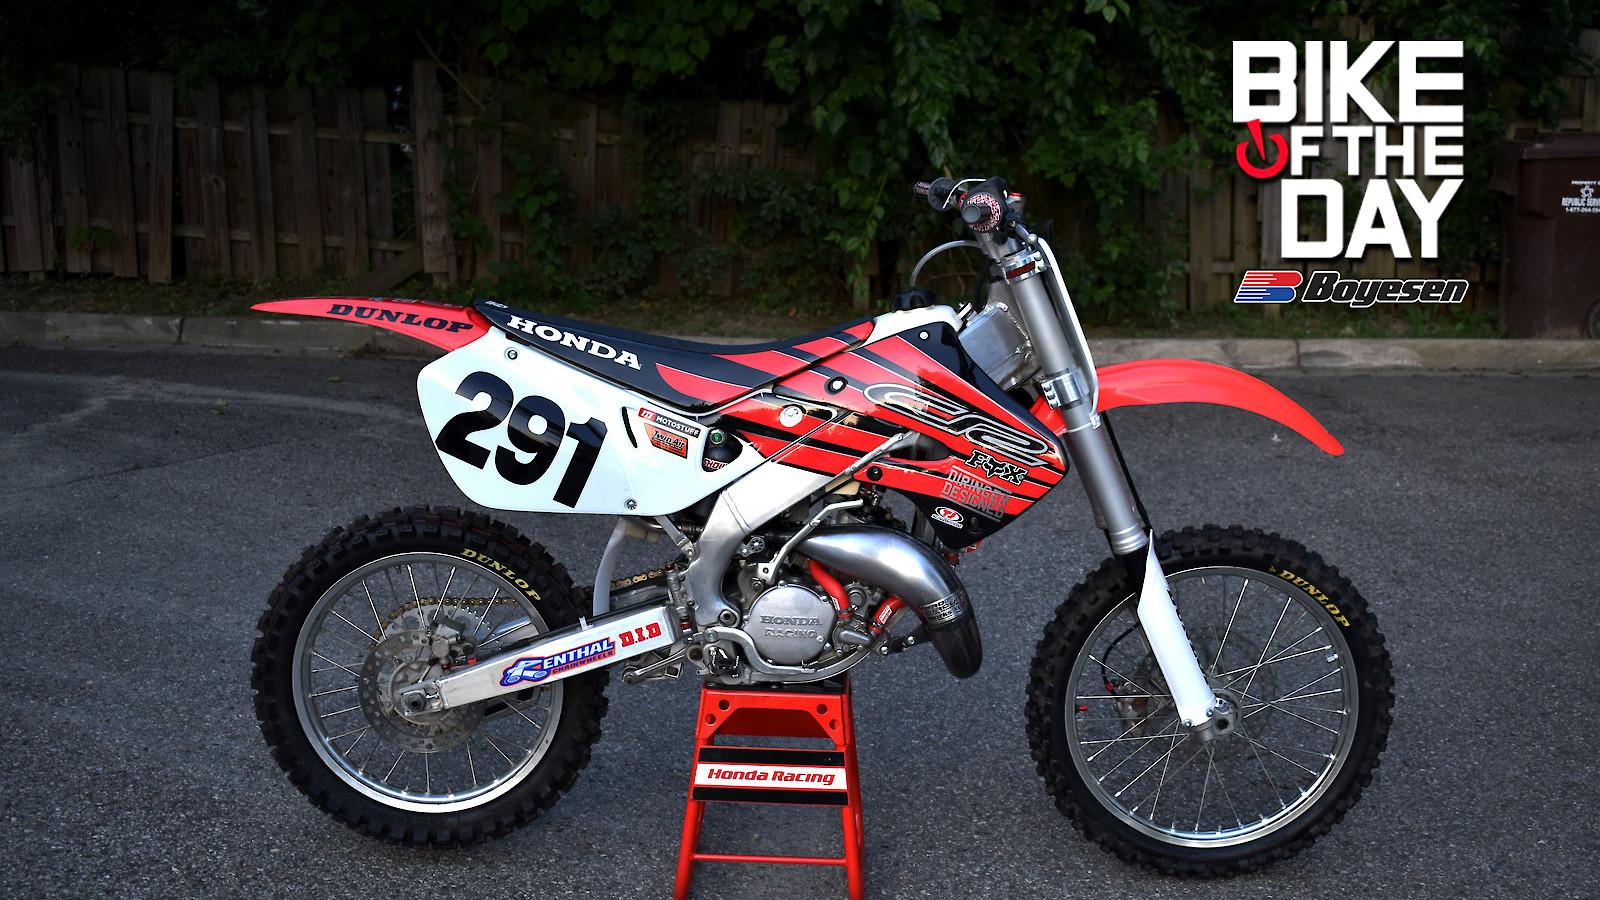 1998 CR125 Works Replica